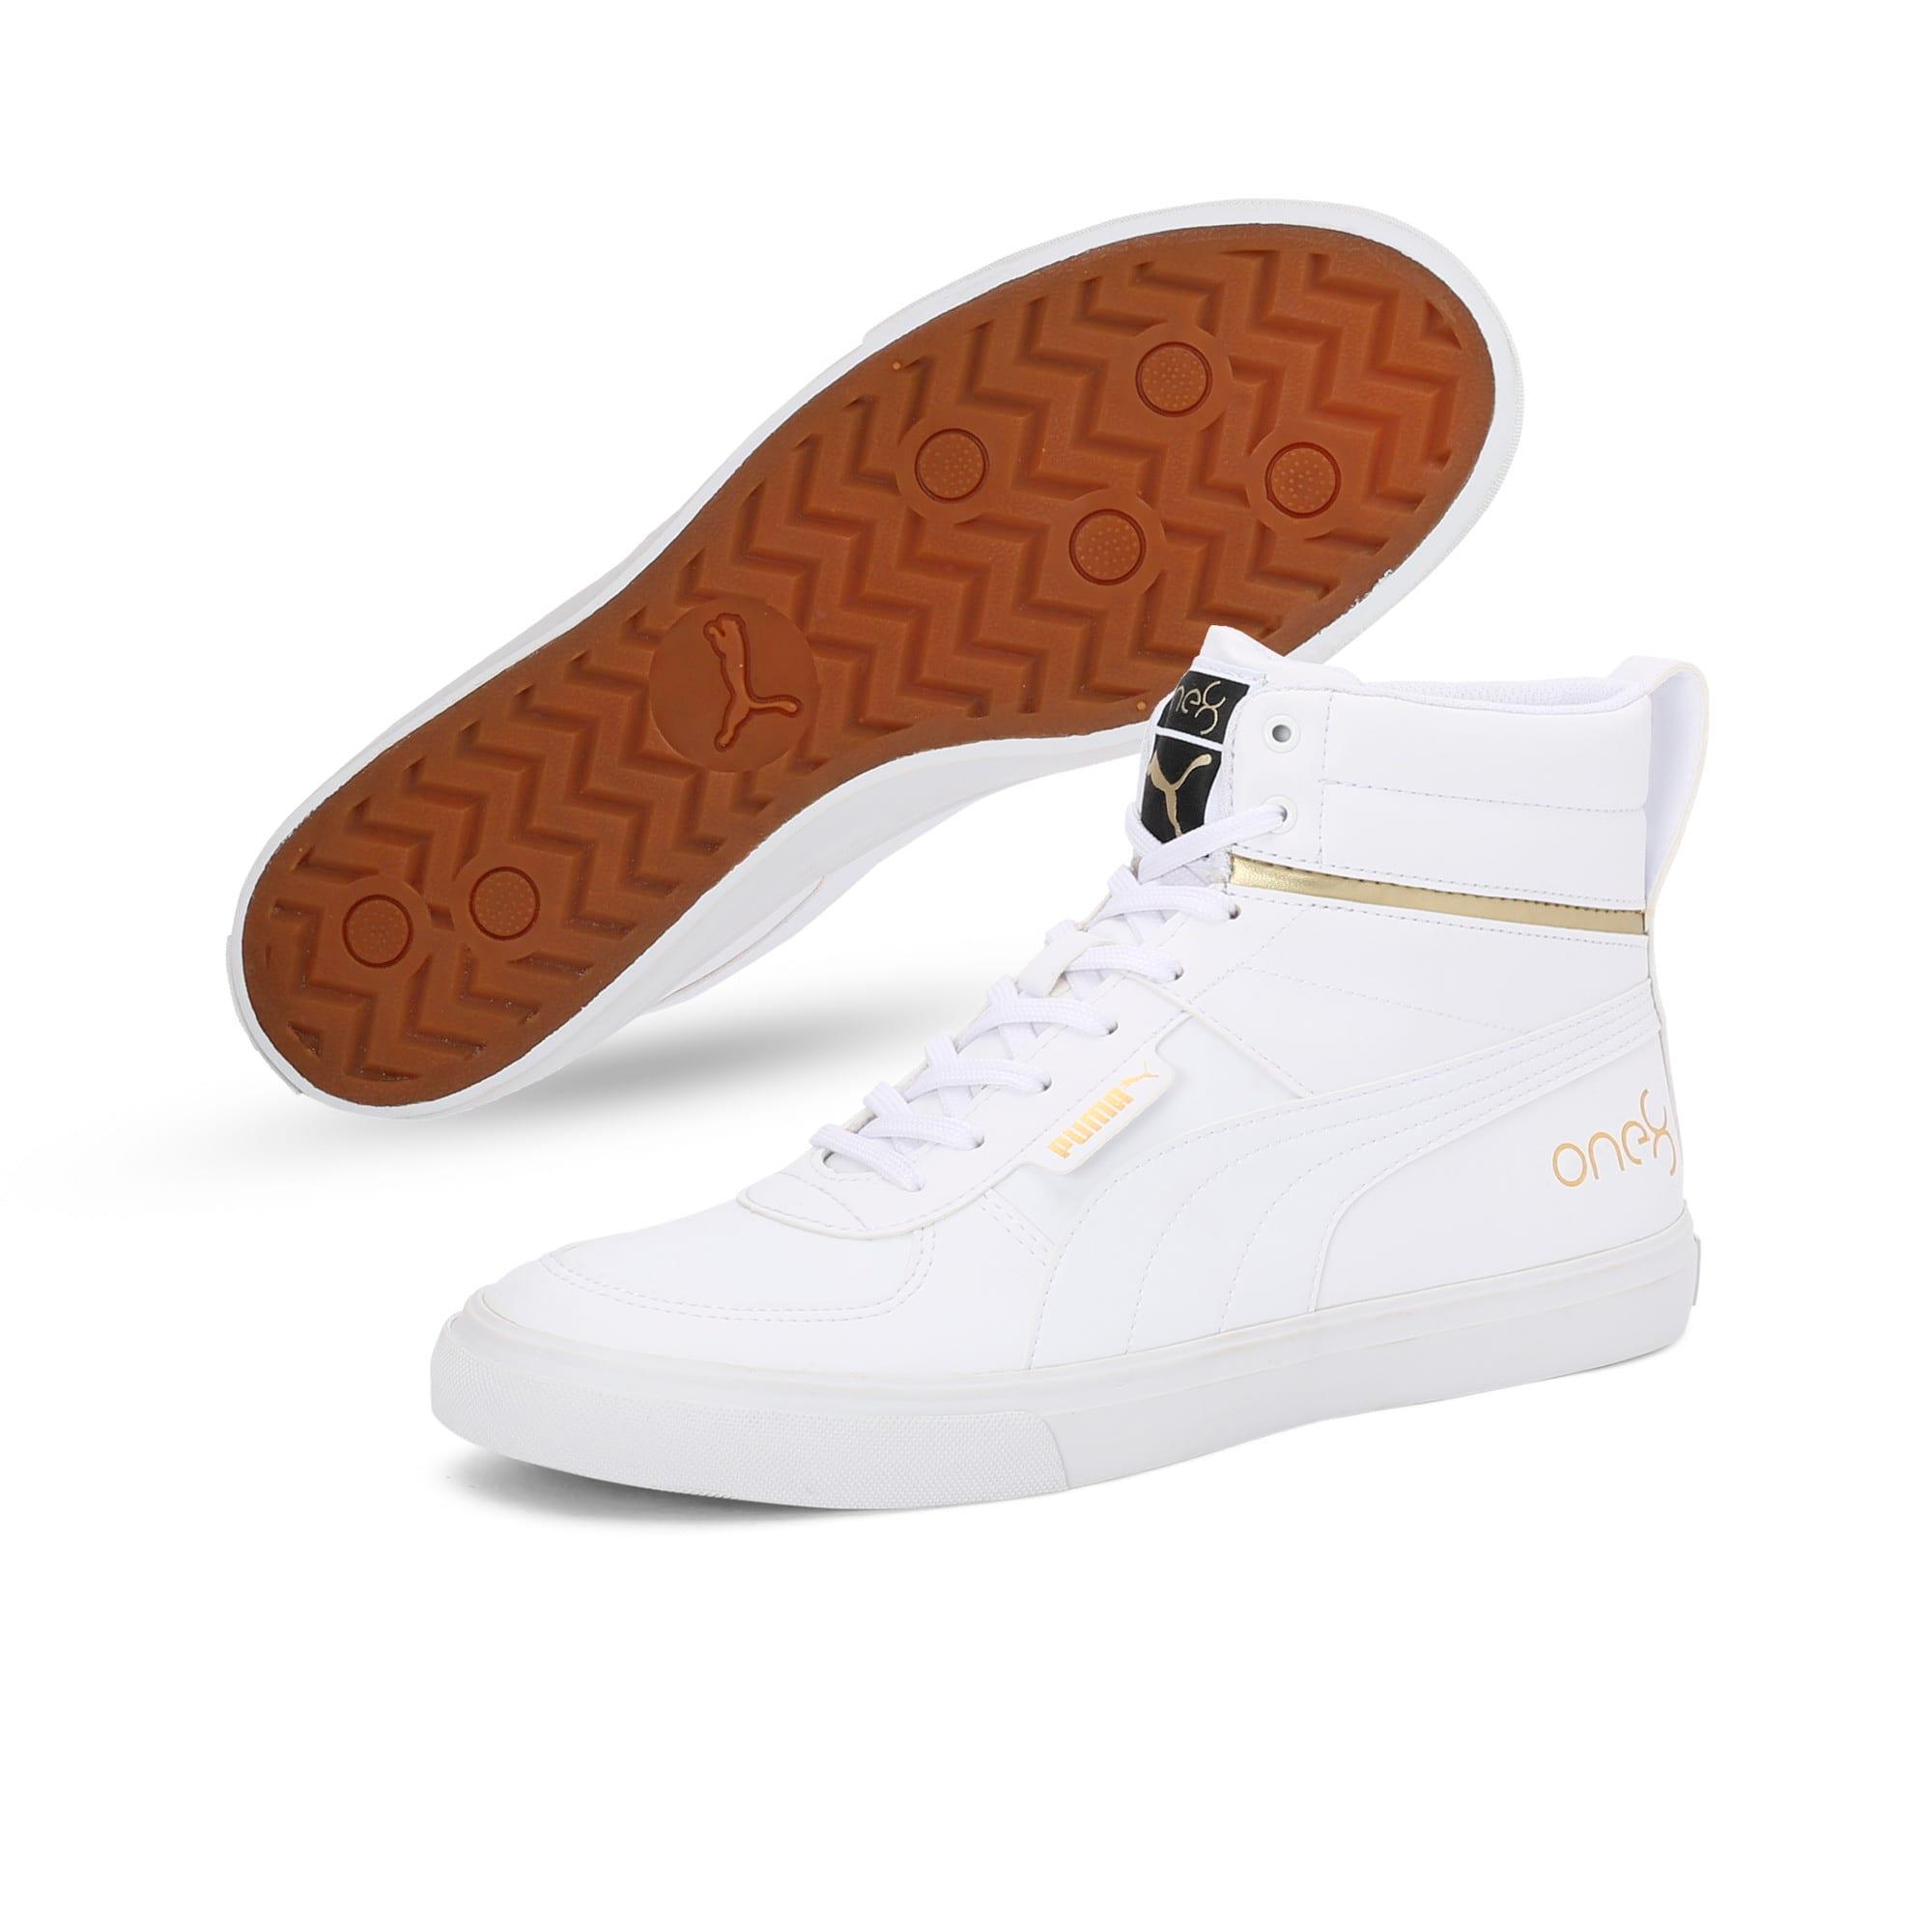 Thumbnail 2 of one8 Mid Men's Sneakers, Puma White-Puma Team Gold, medium-IND